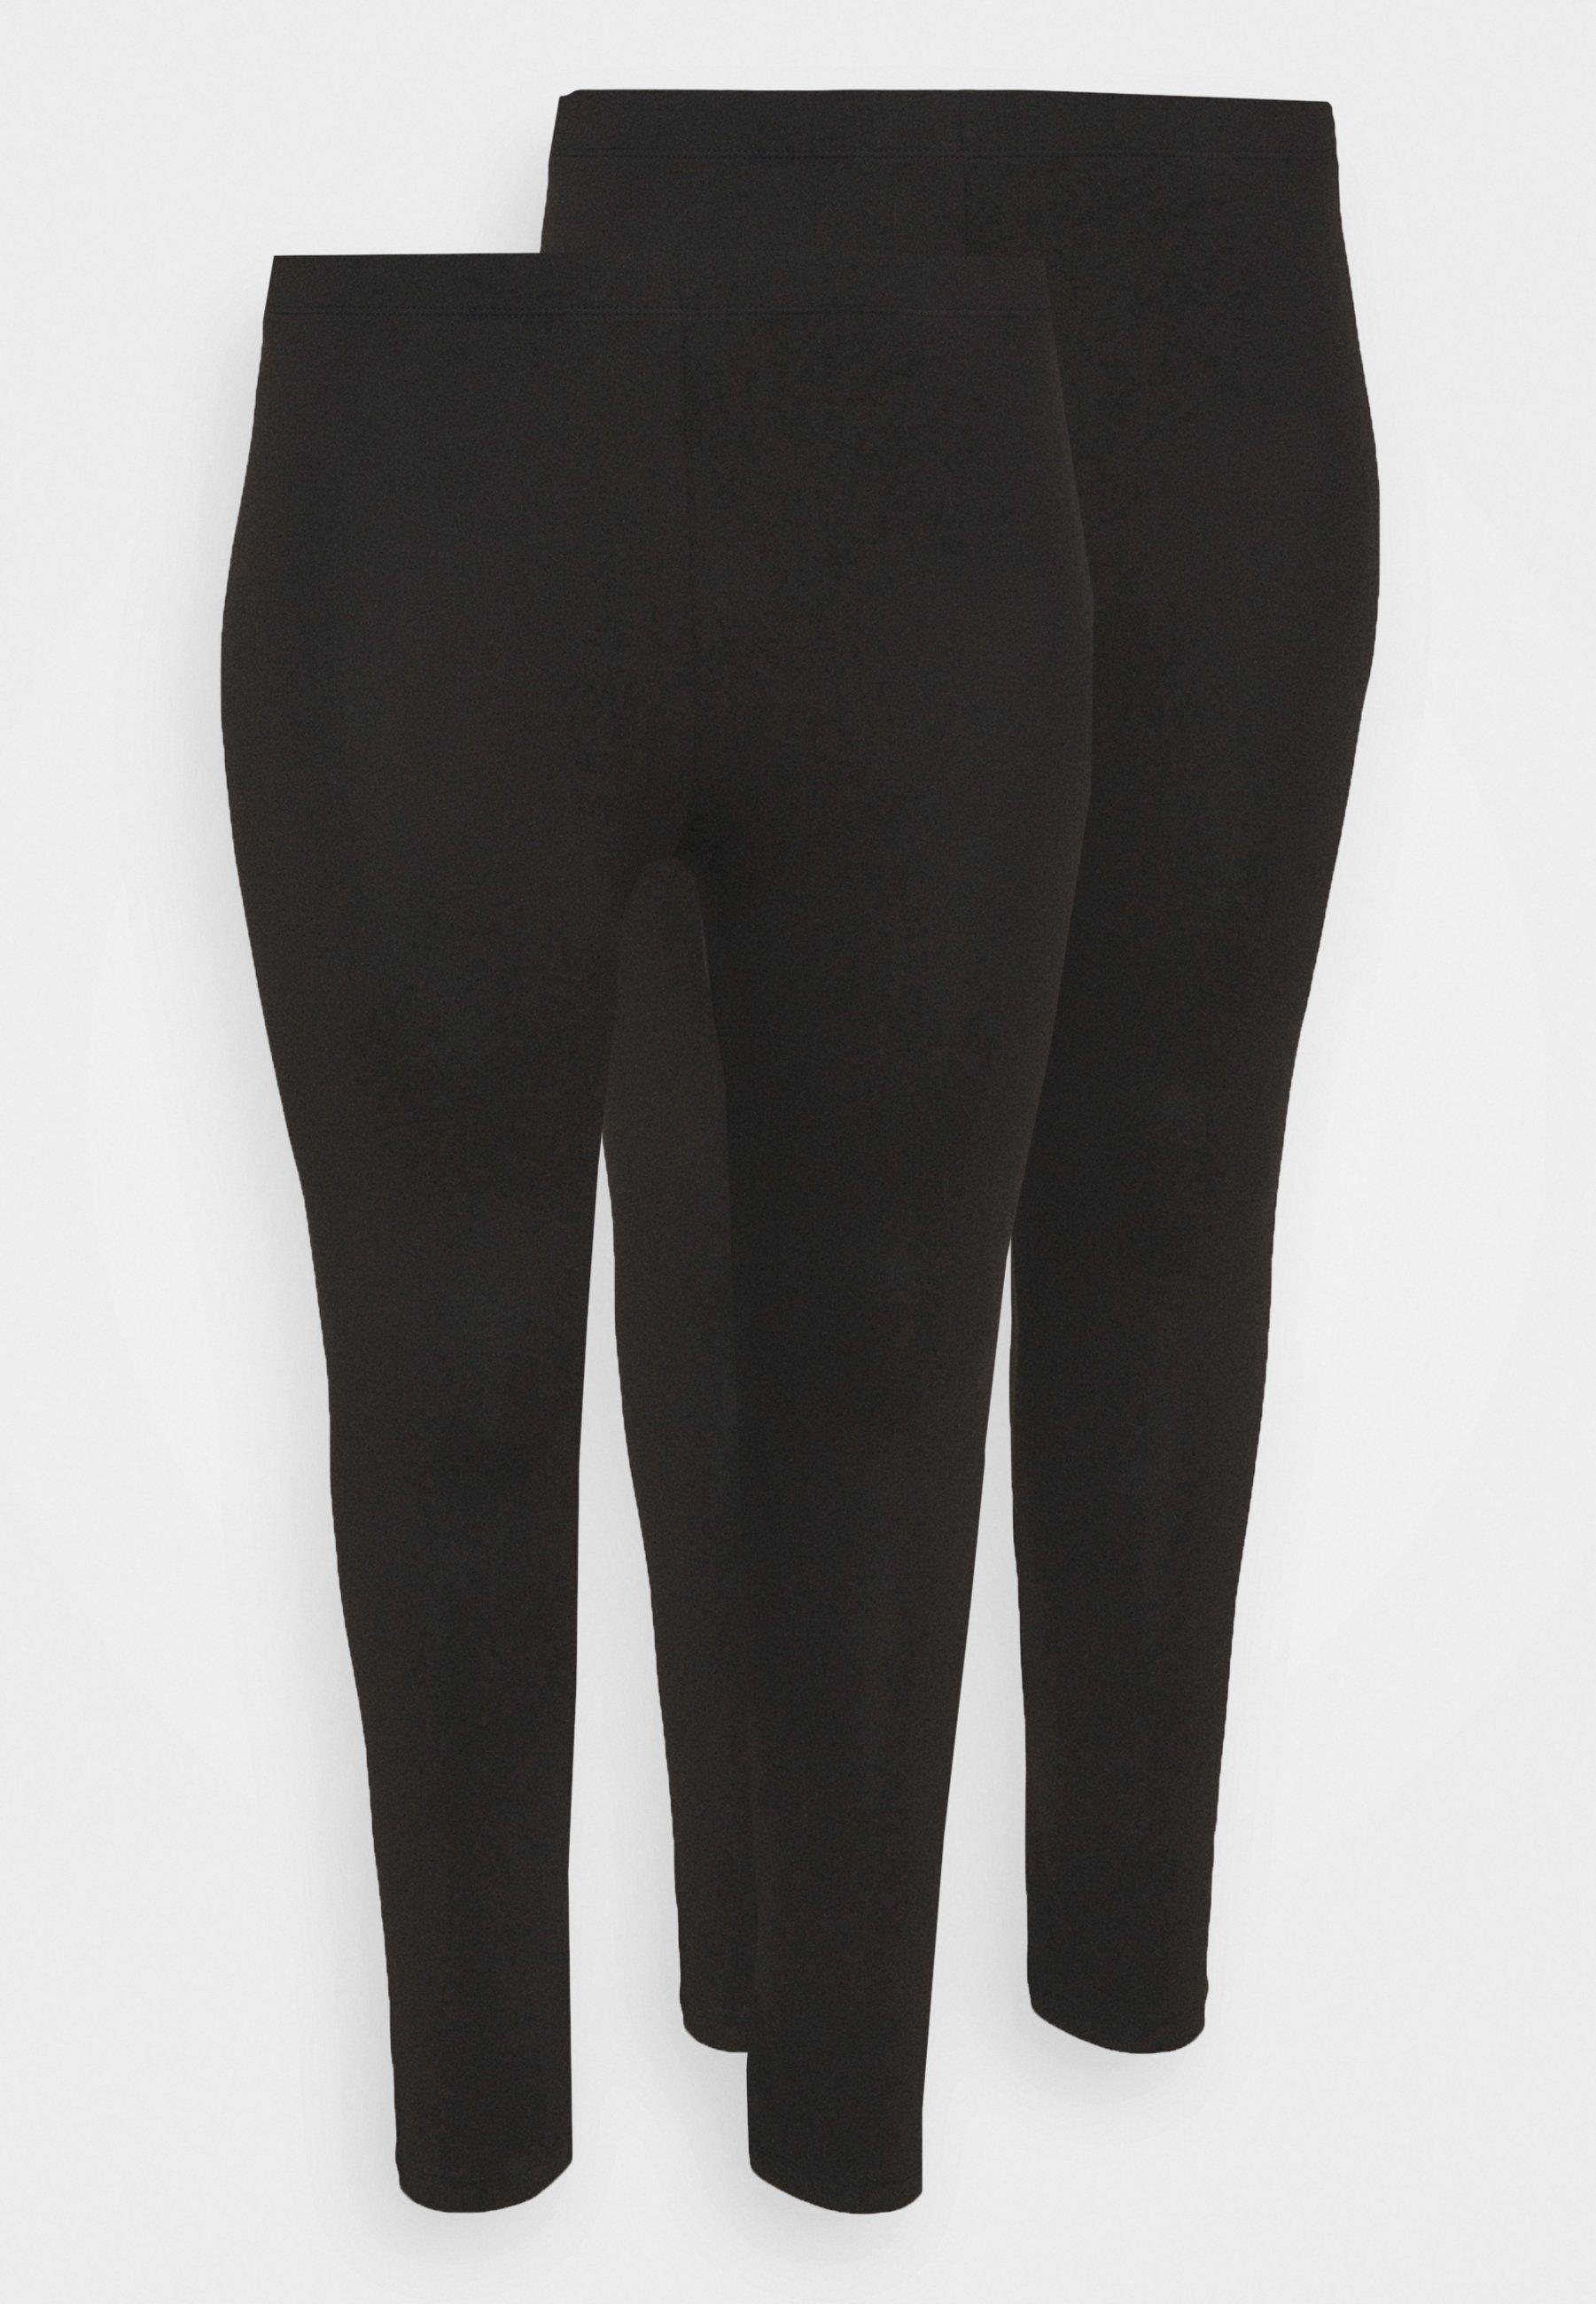 Women 2 PACK - 7/8 LENGHT LEGGING - Leggings - Trousers